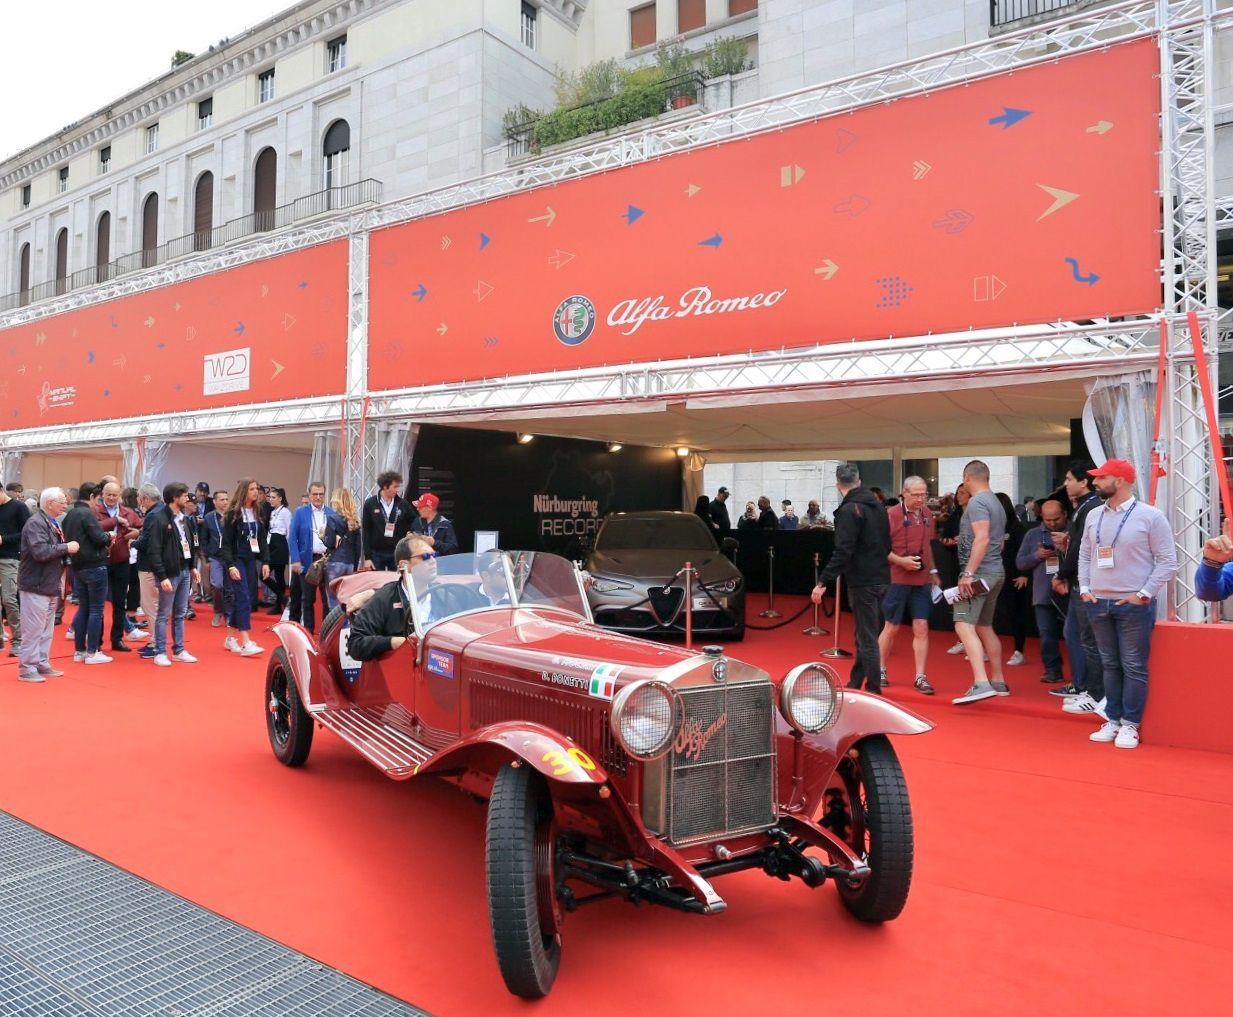 180516_Alfa_Romeo_Mille_Miglia_2018_1